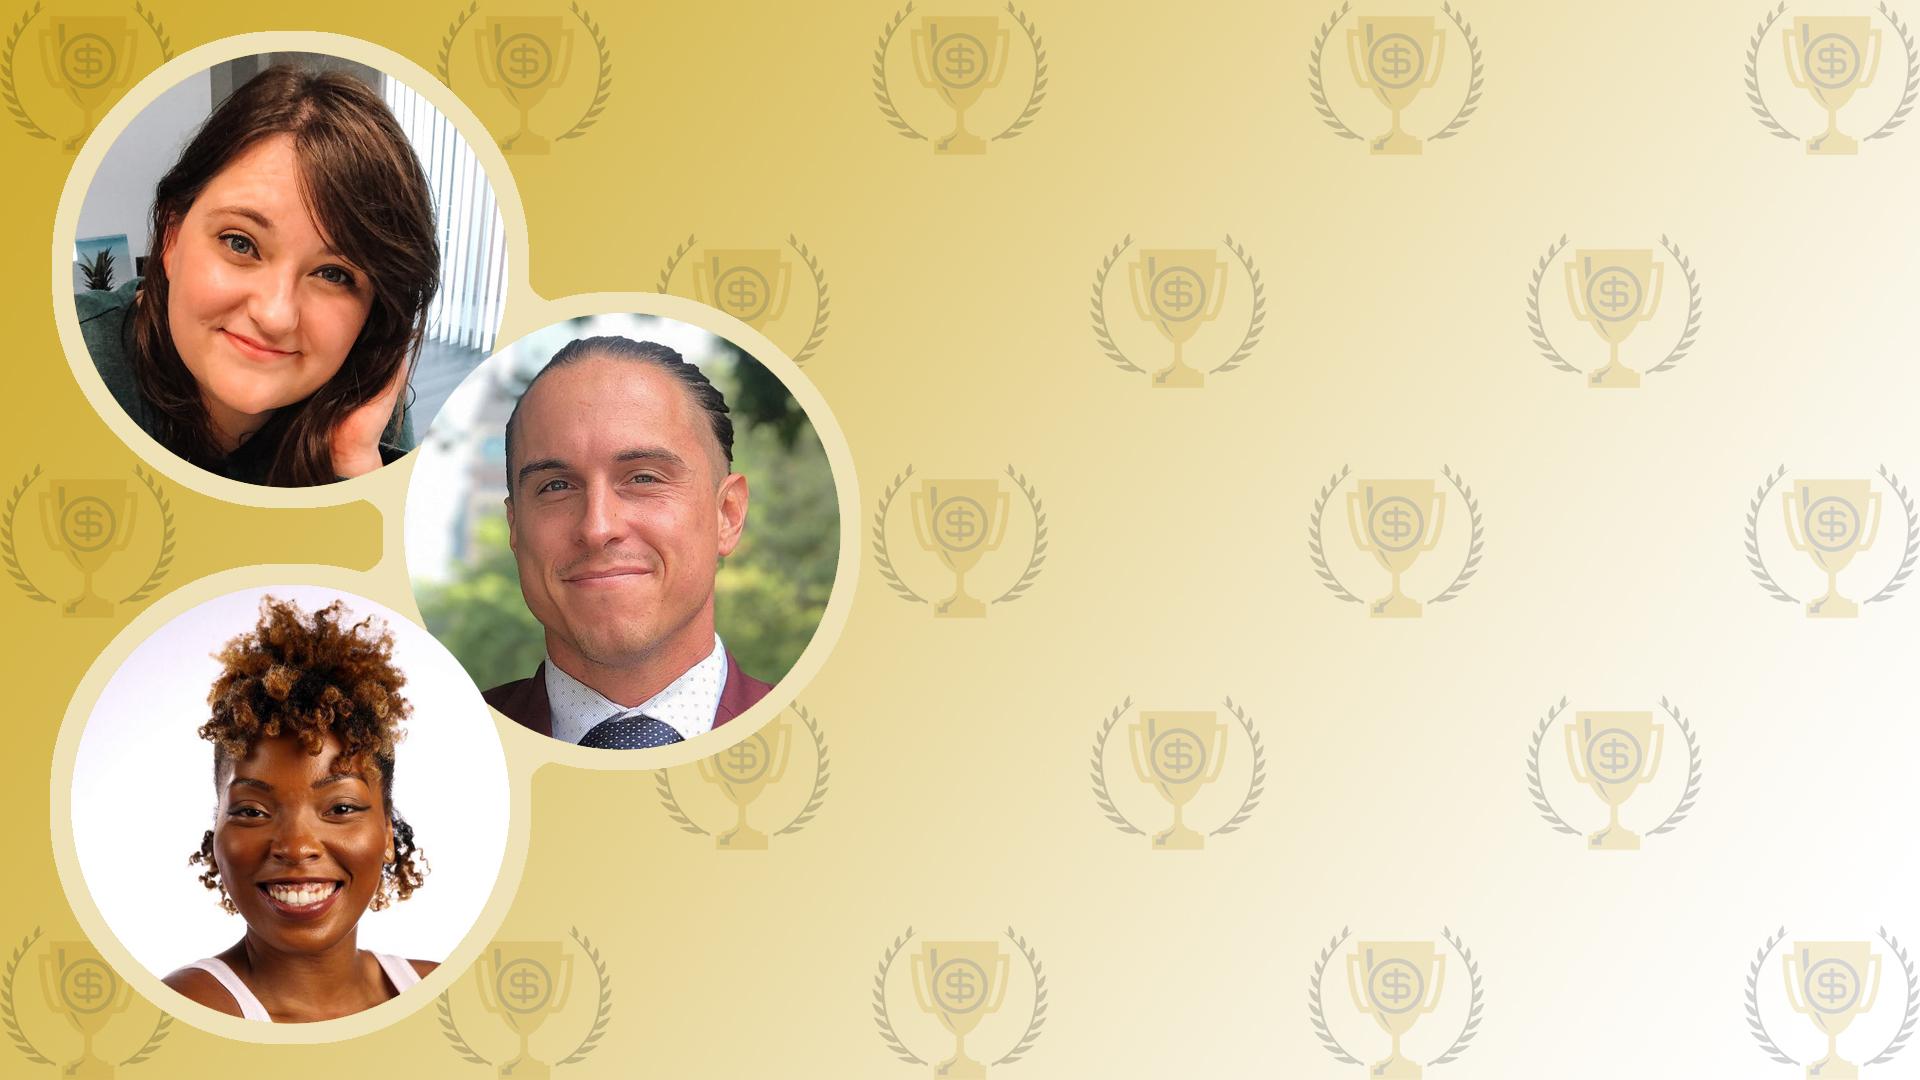 Plutus Awards Podcast – TikTok and Instagram